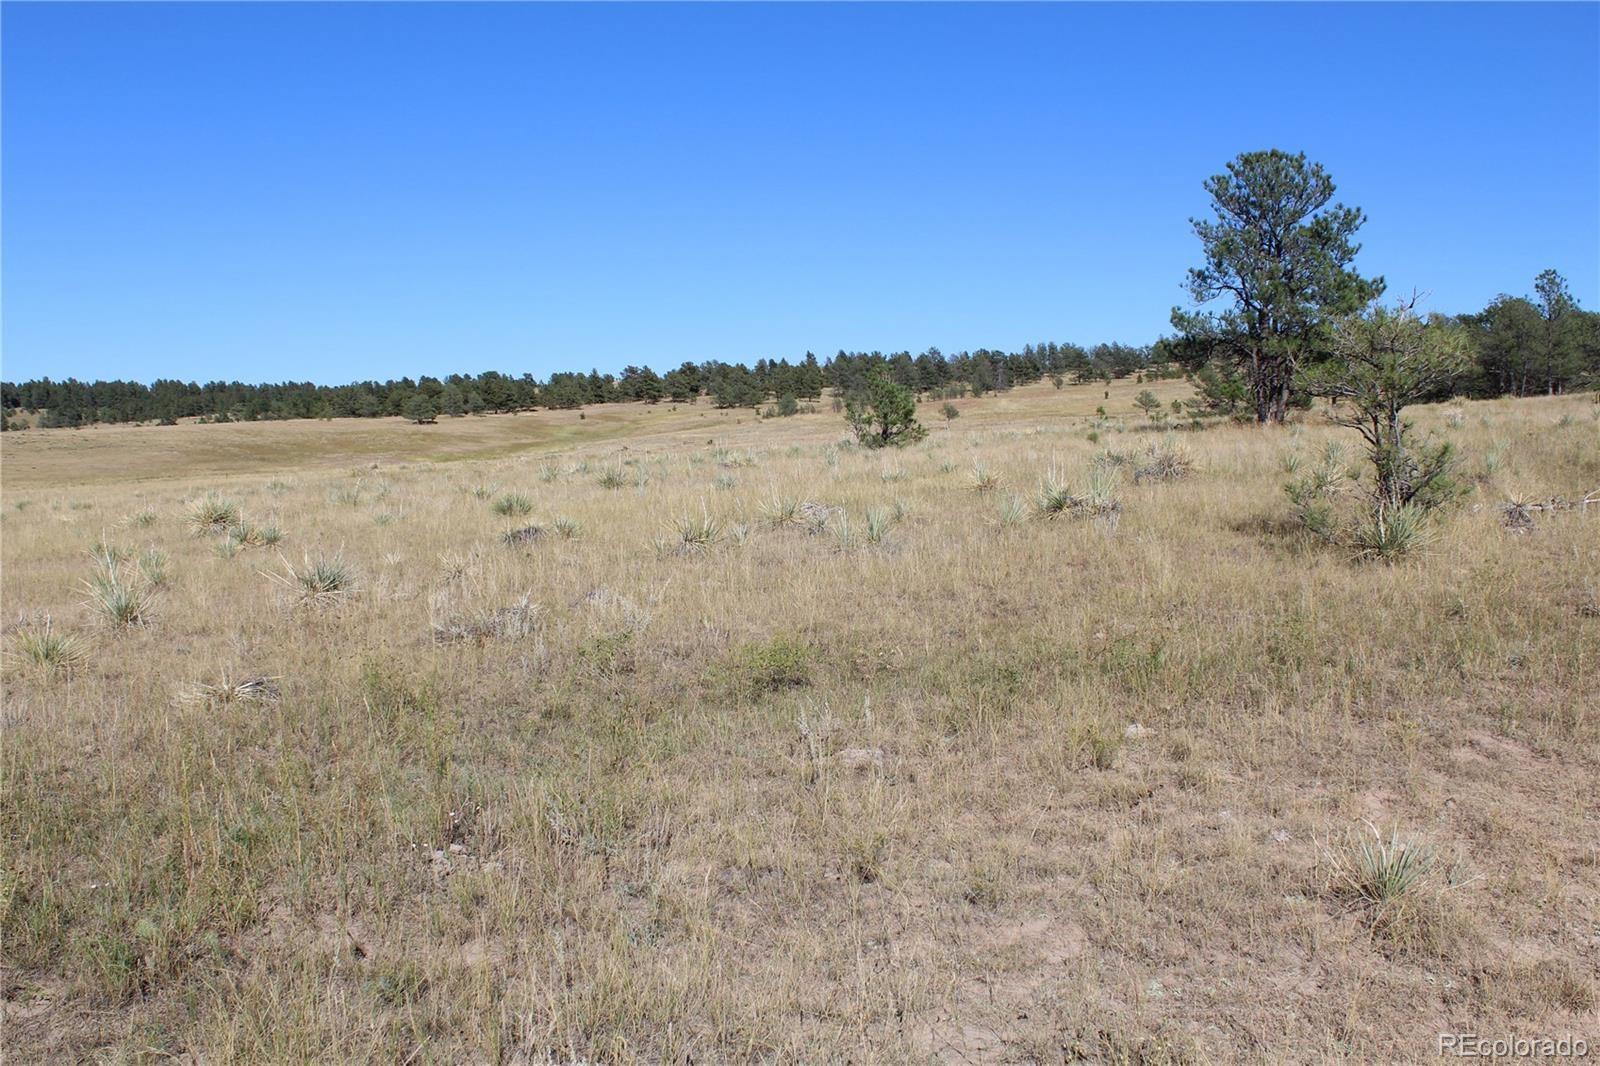 MLS# 2877174 - 15 - Cattle Circle, Kiowa, CO 80117